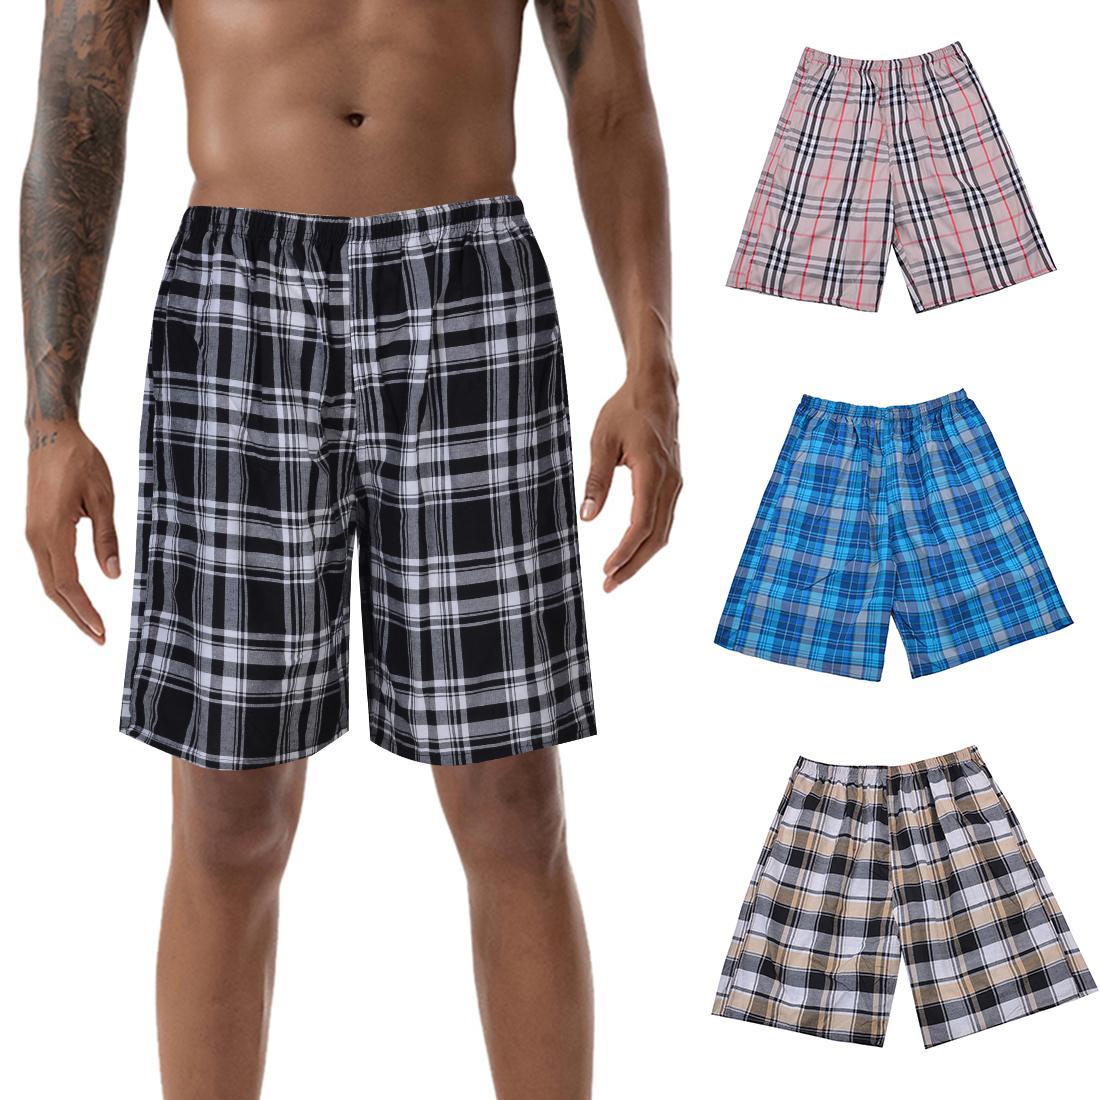 Summer Men Shorts Plaid Casual Short Pant 2020 Short Trousers Homewear Pantalon Corto Hombre Pajamas Shorts Loose Sweat Shorts